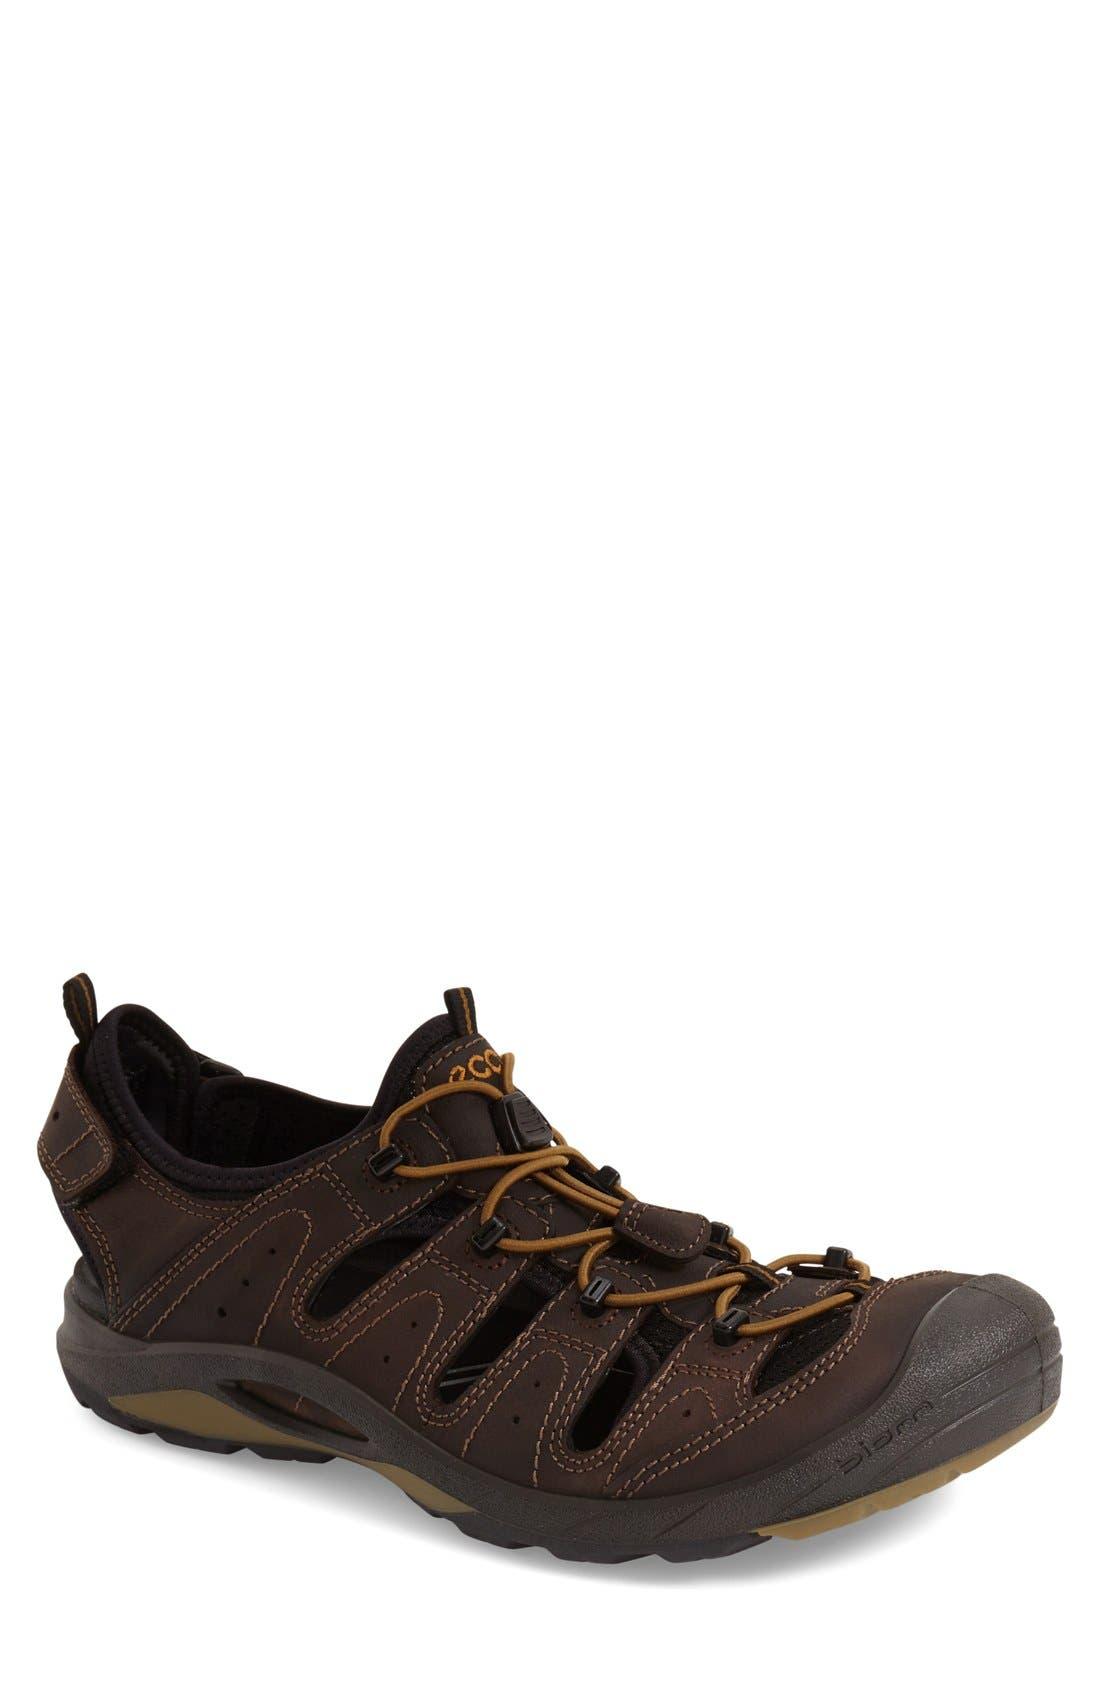 'BIOM Delta Offroad' Sandal,                         Main,                         color,